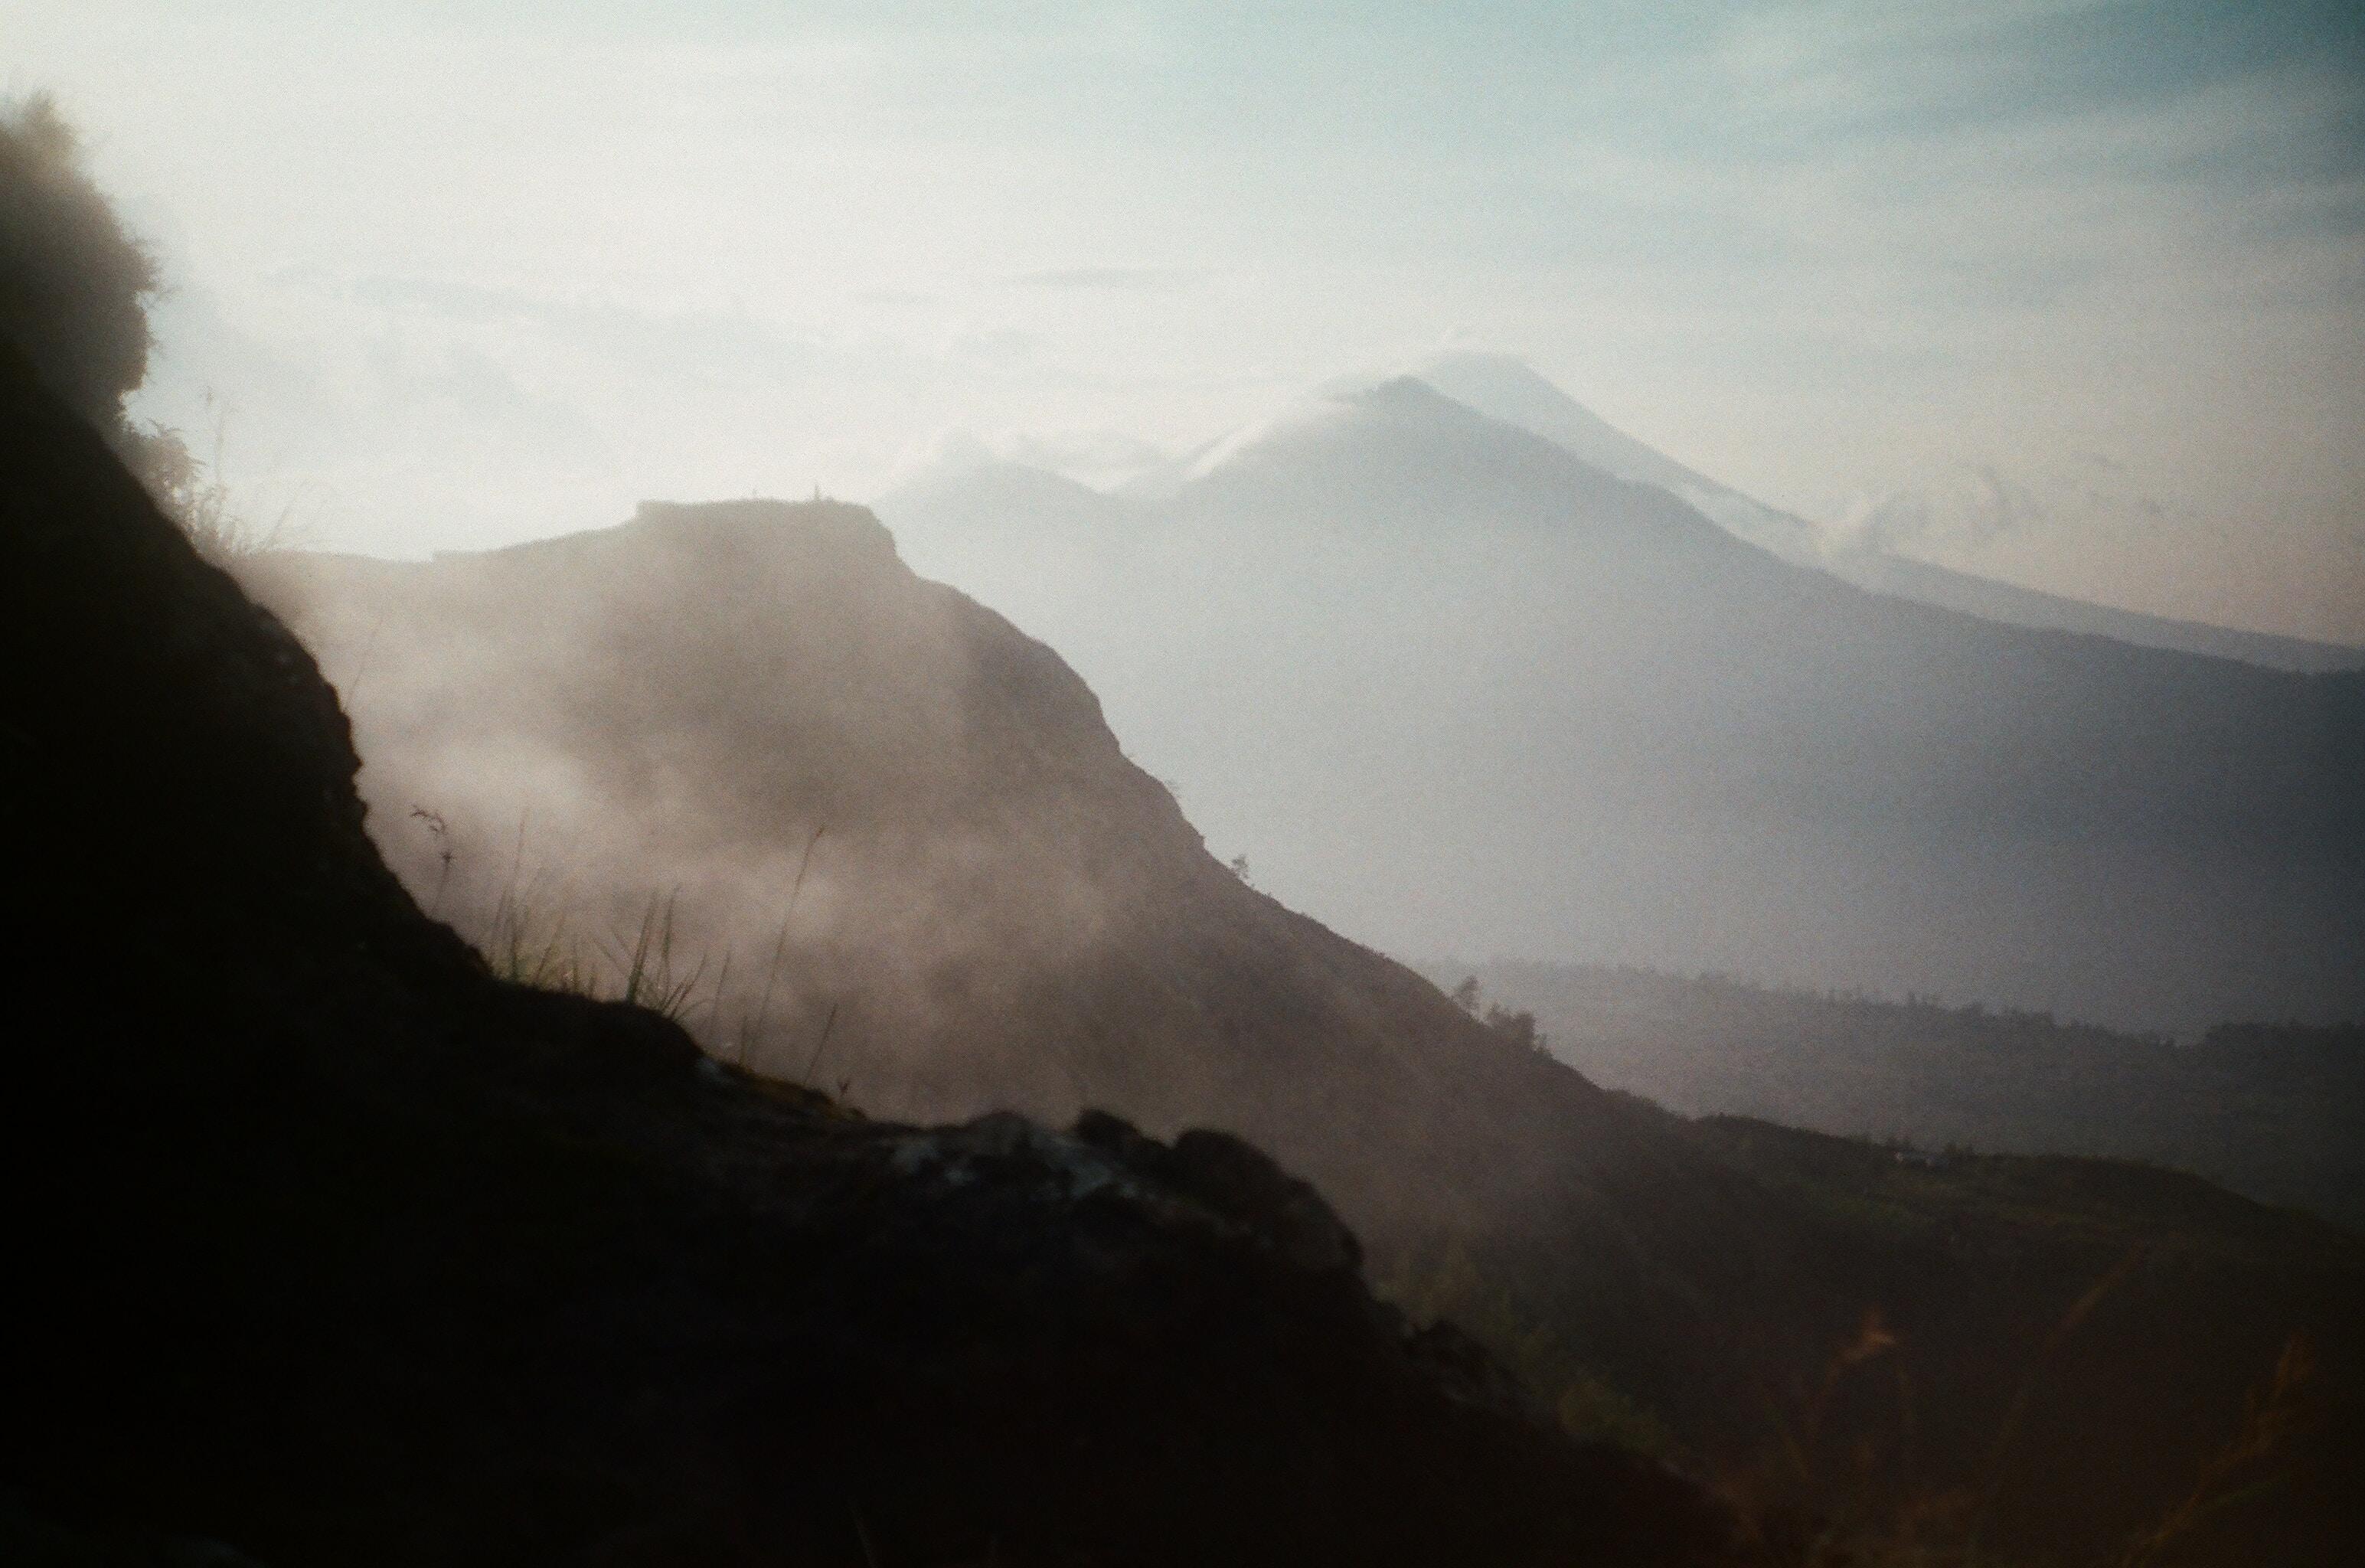 brown foggy mountain during daytime